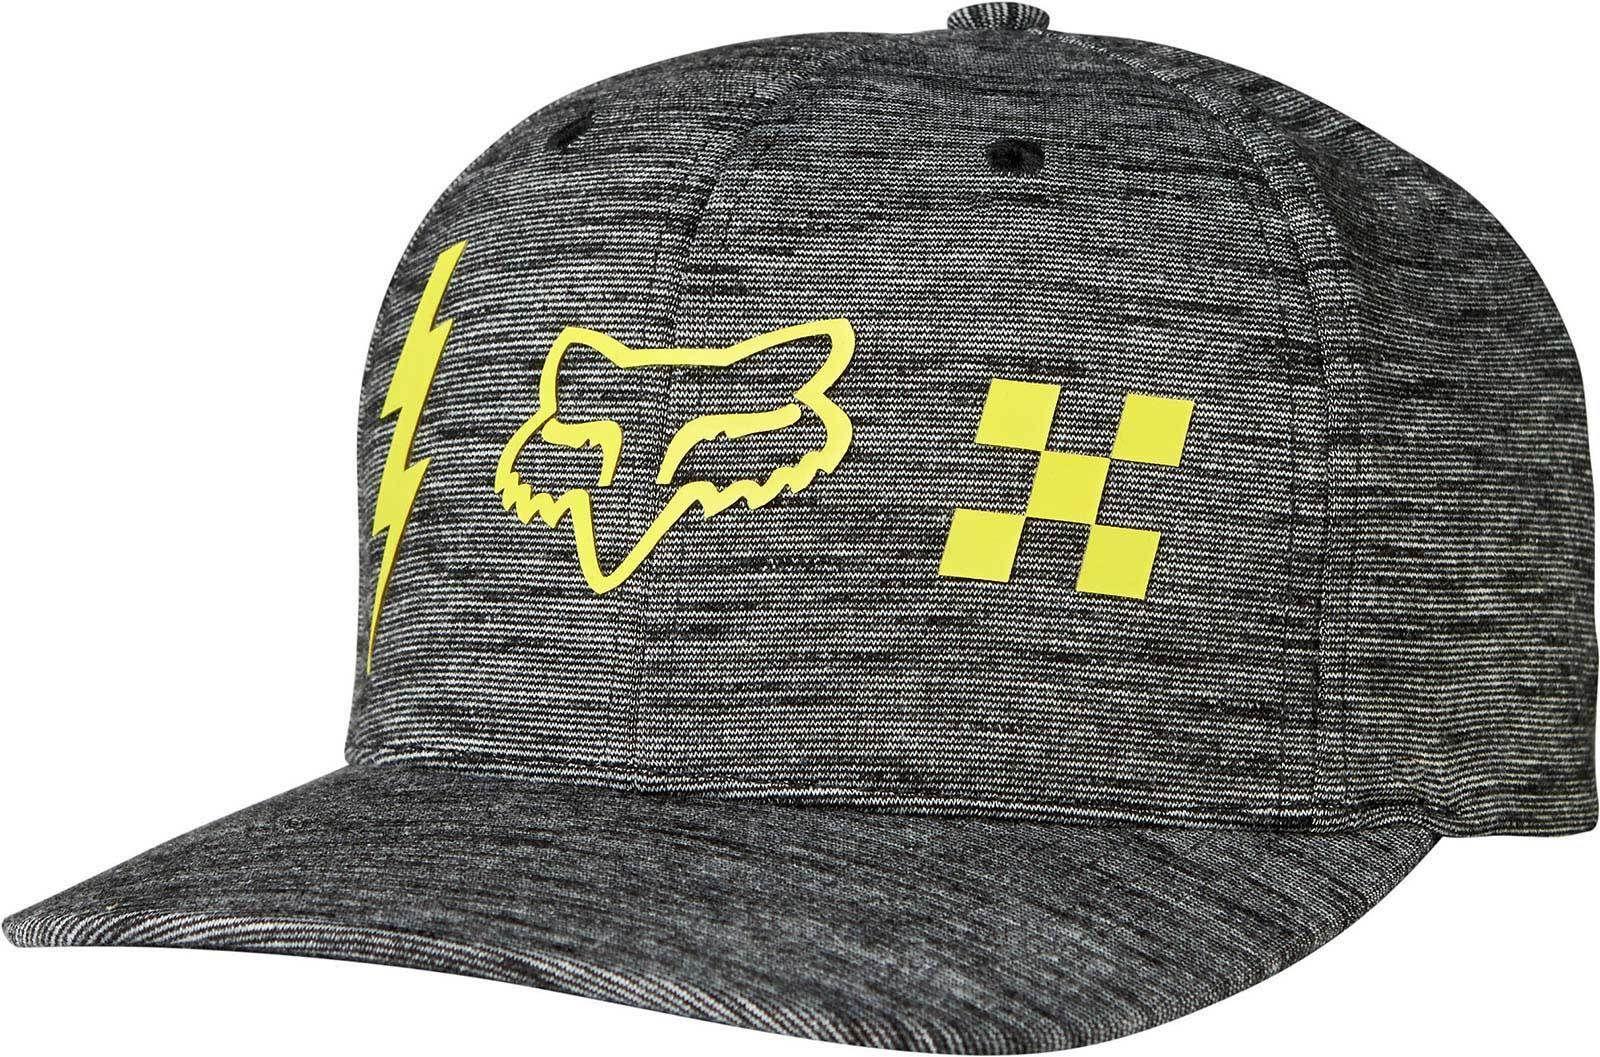 wholesale dealer 42165 0836a Fox Racing Striker Check Flexfit Hat - Adult Mens Guys Lid Cap Mx Atv Mtb